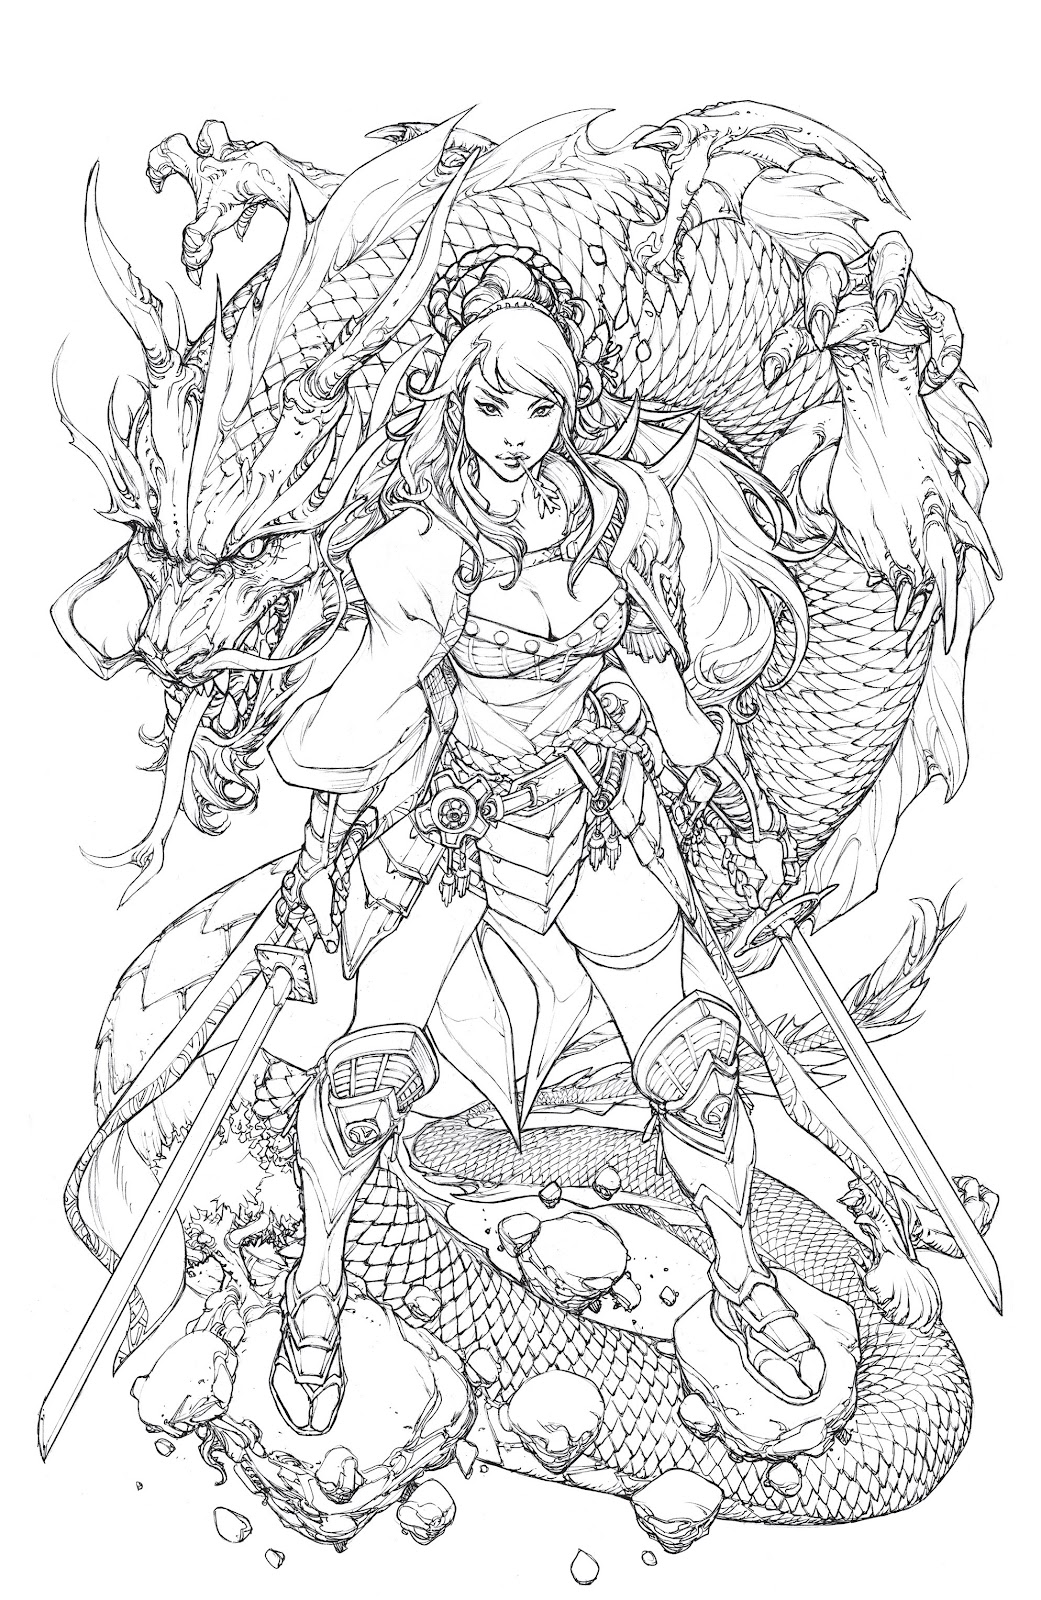 Read online Oniba: Swords of the Demon comic -  Issue # Full - 22